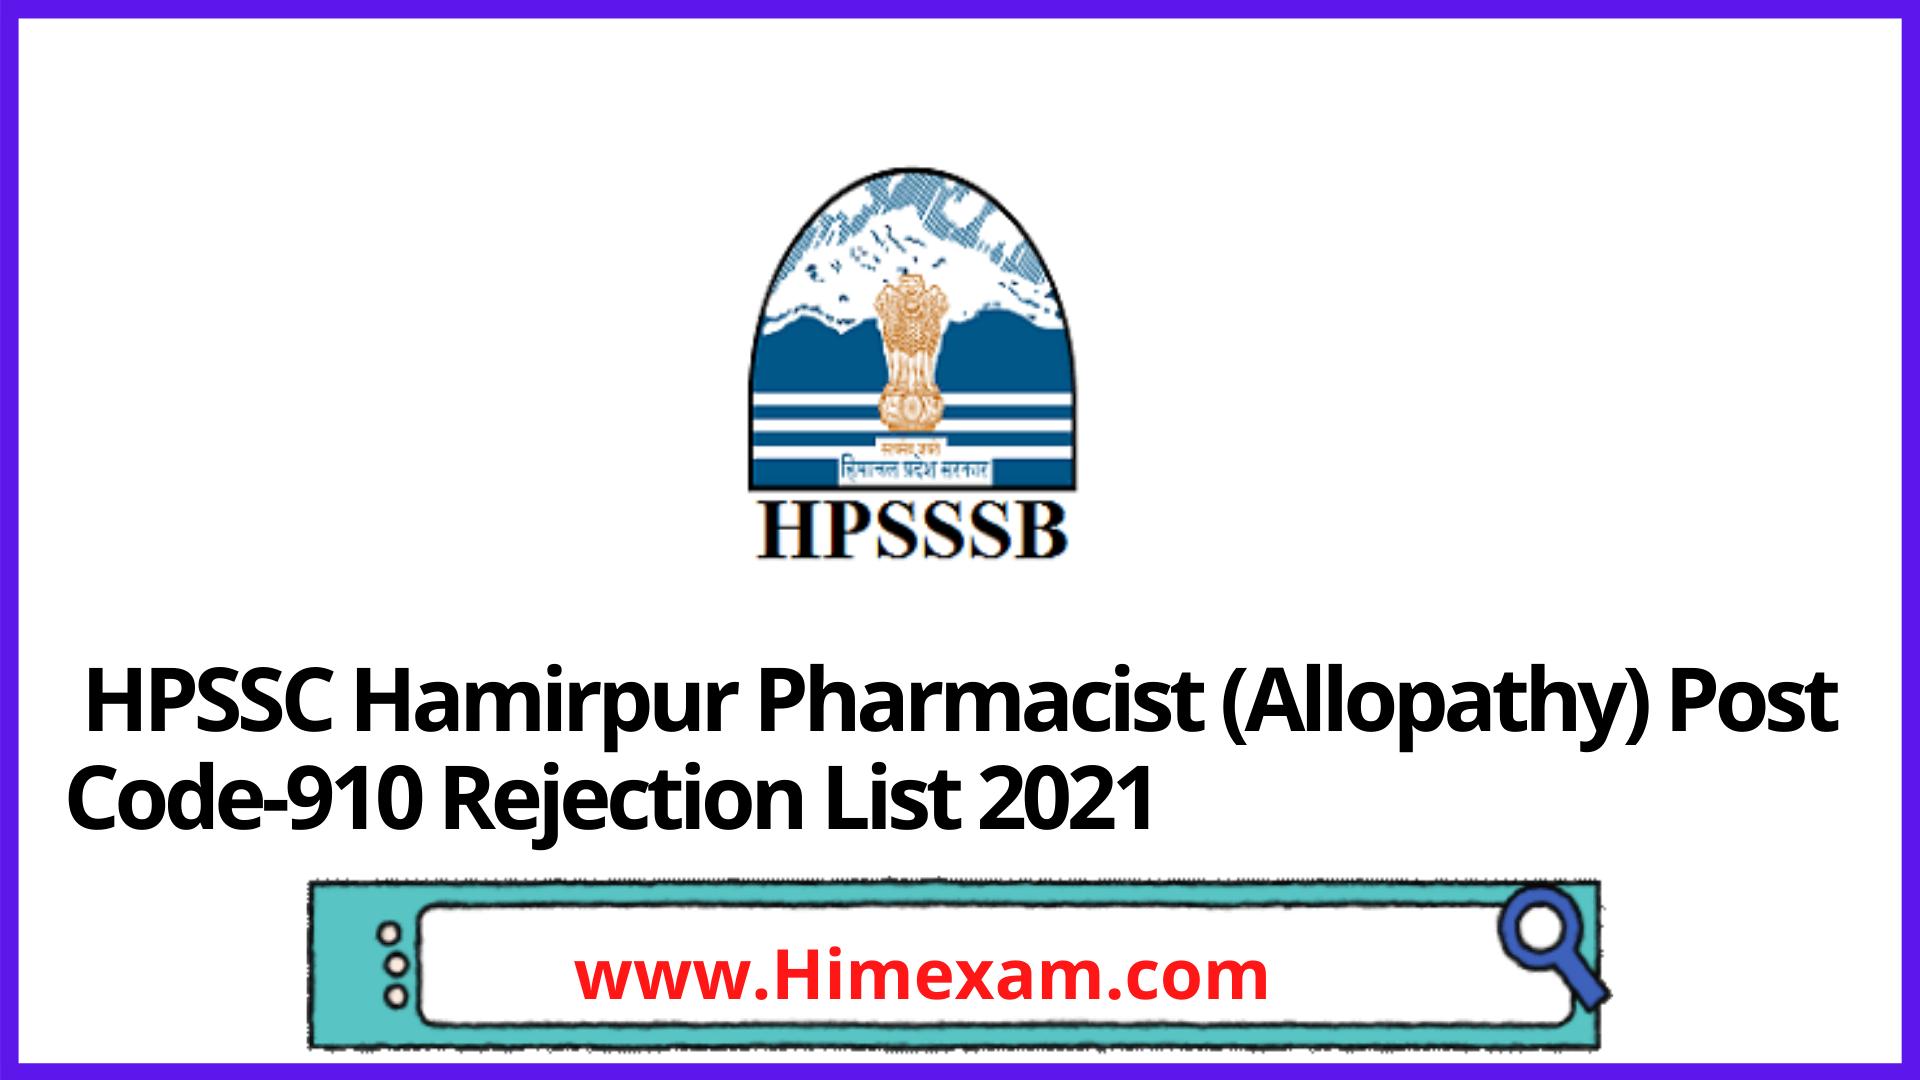 HPSSC Hamirpur Pharmacist (Allopathy) Post Code-910 Rejection List 2021